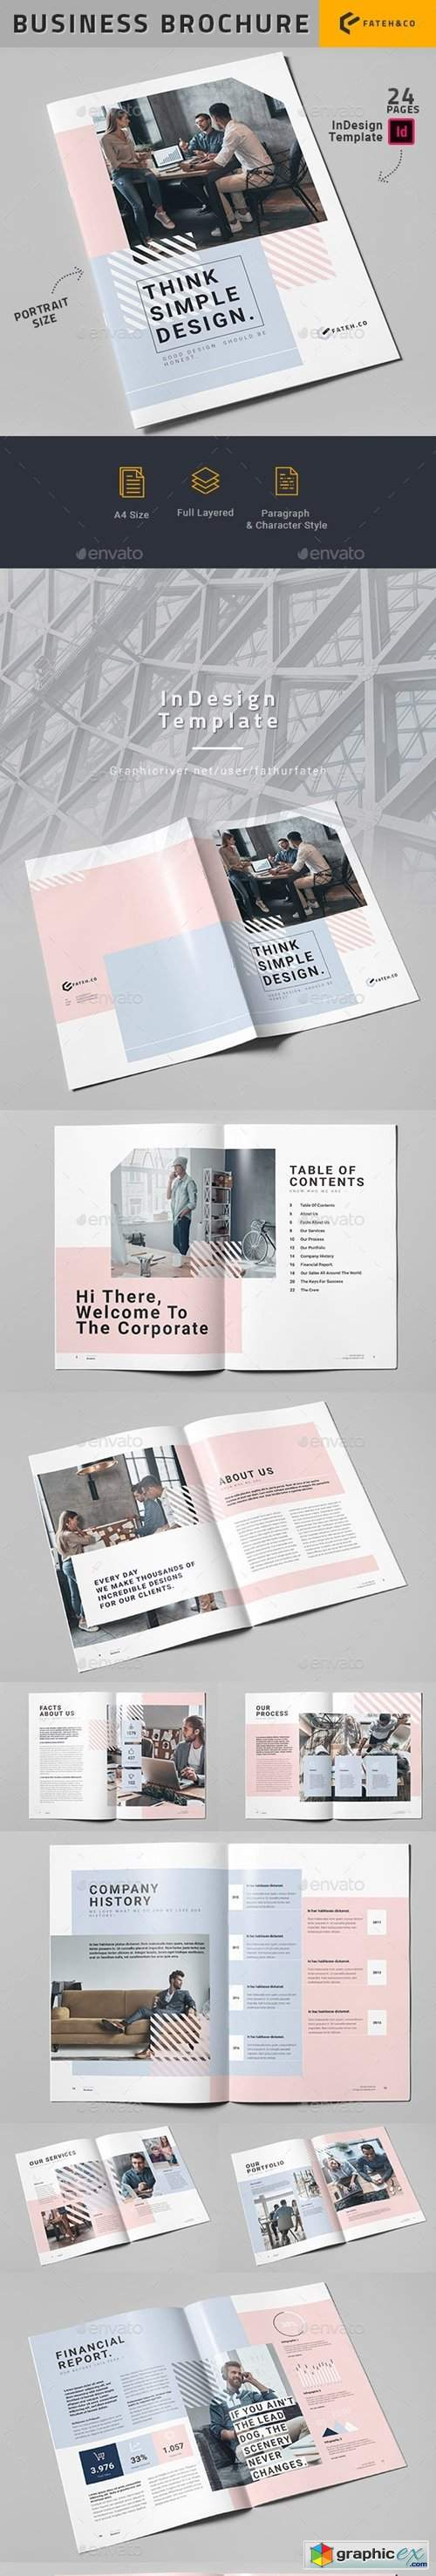 Business Brochure Vol.4